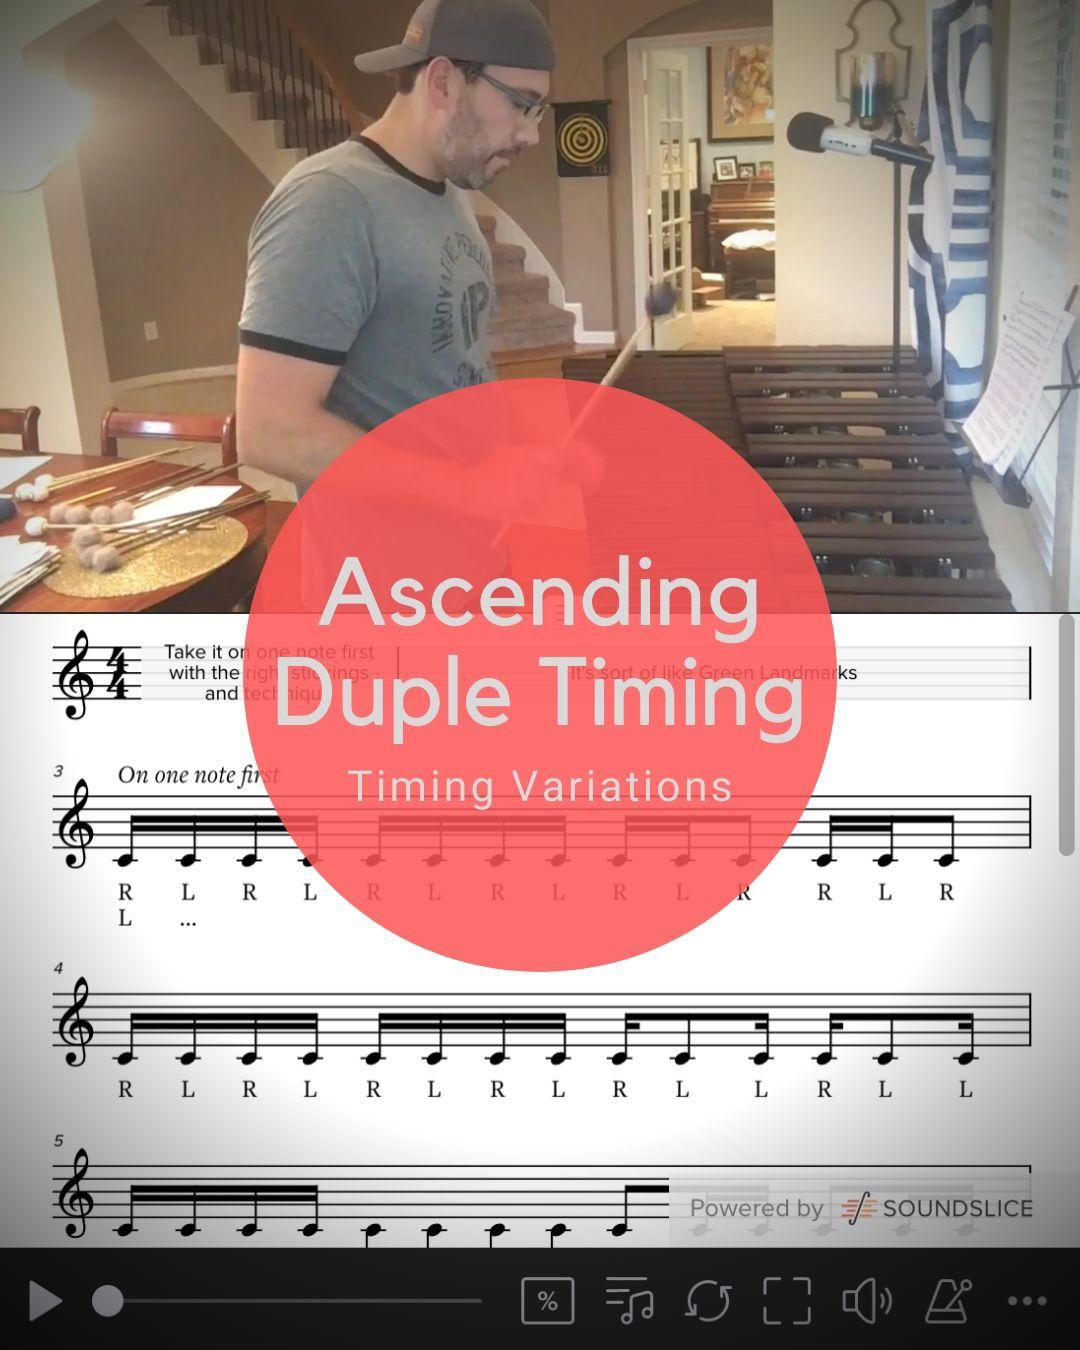 Ascending Duple Timing